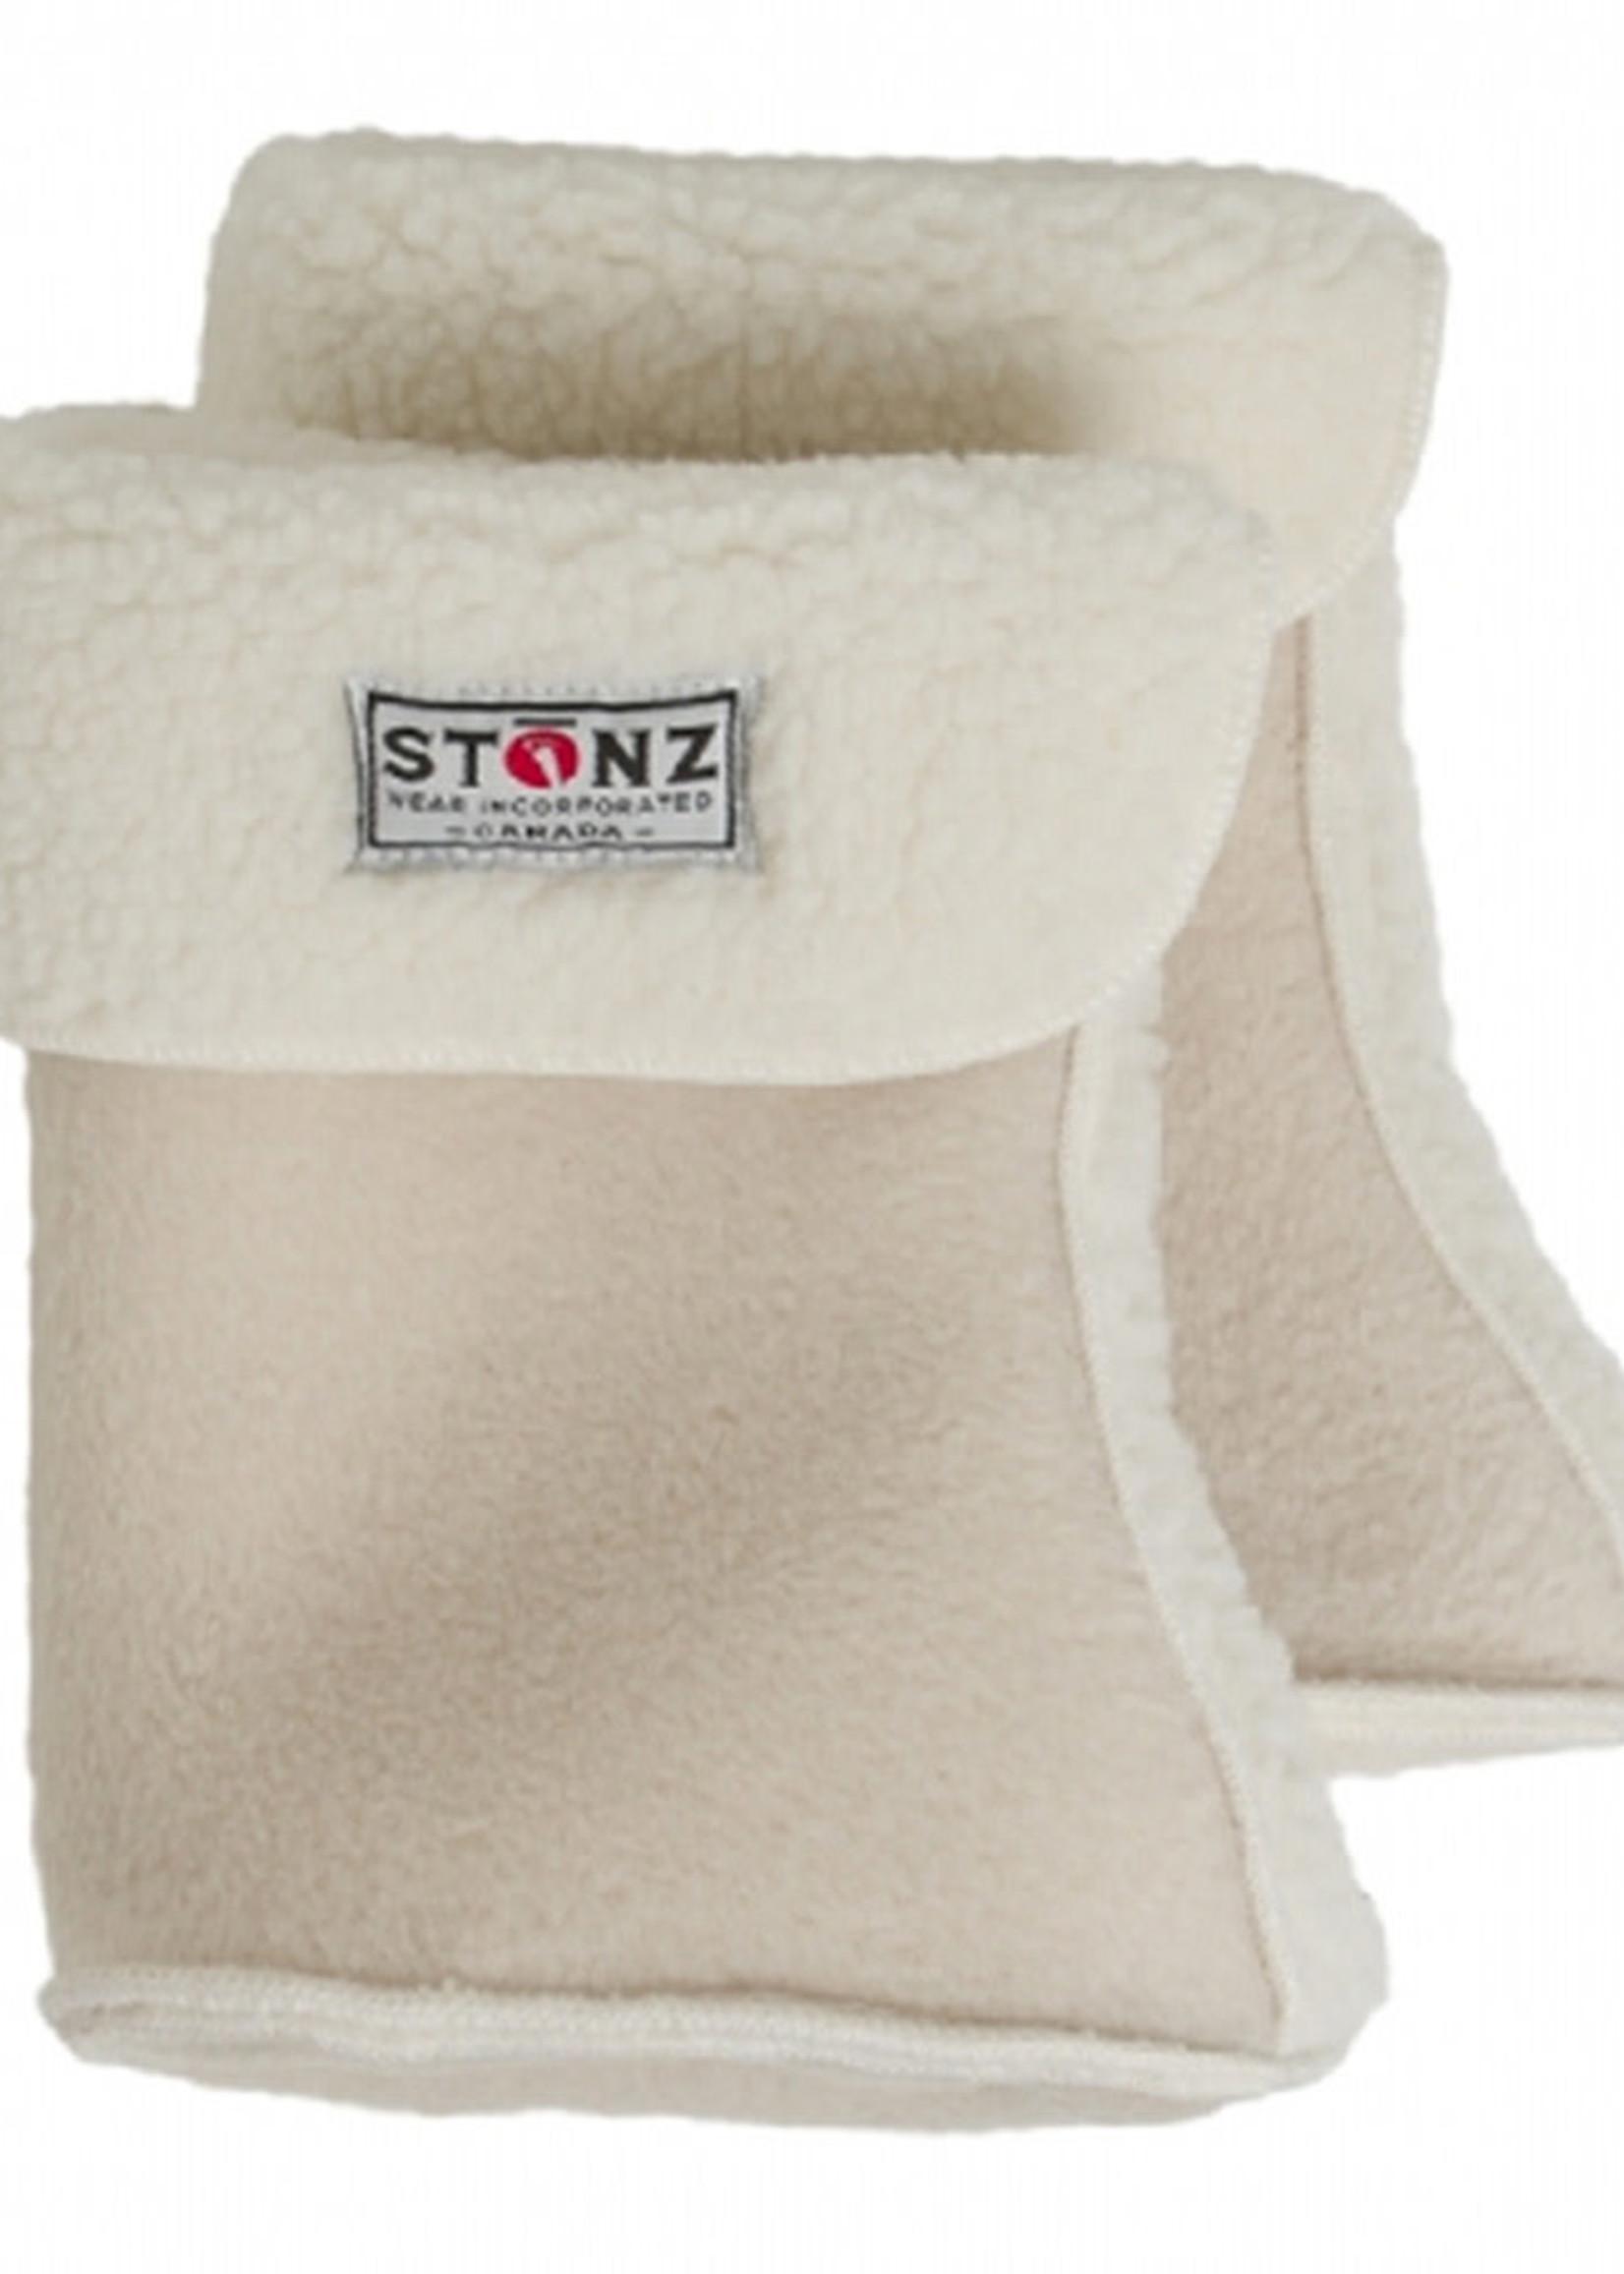 stonz Stonz Sherpa Bonded Liners